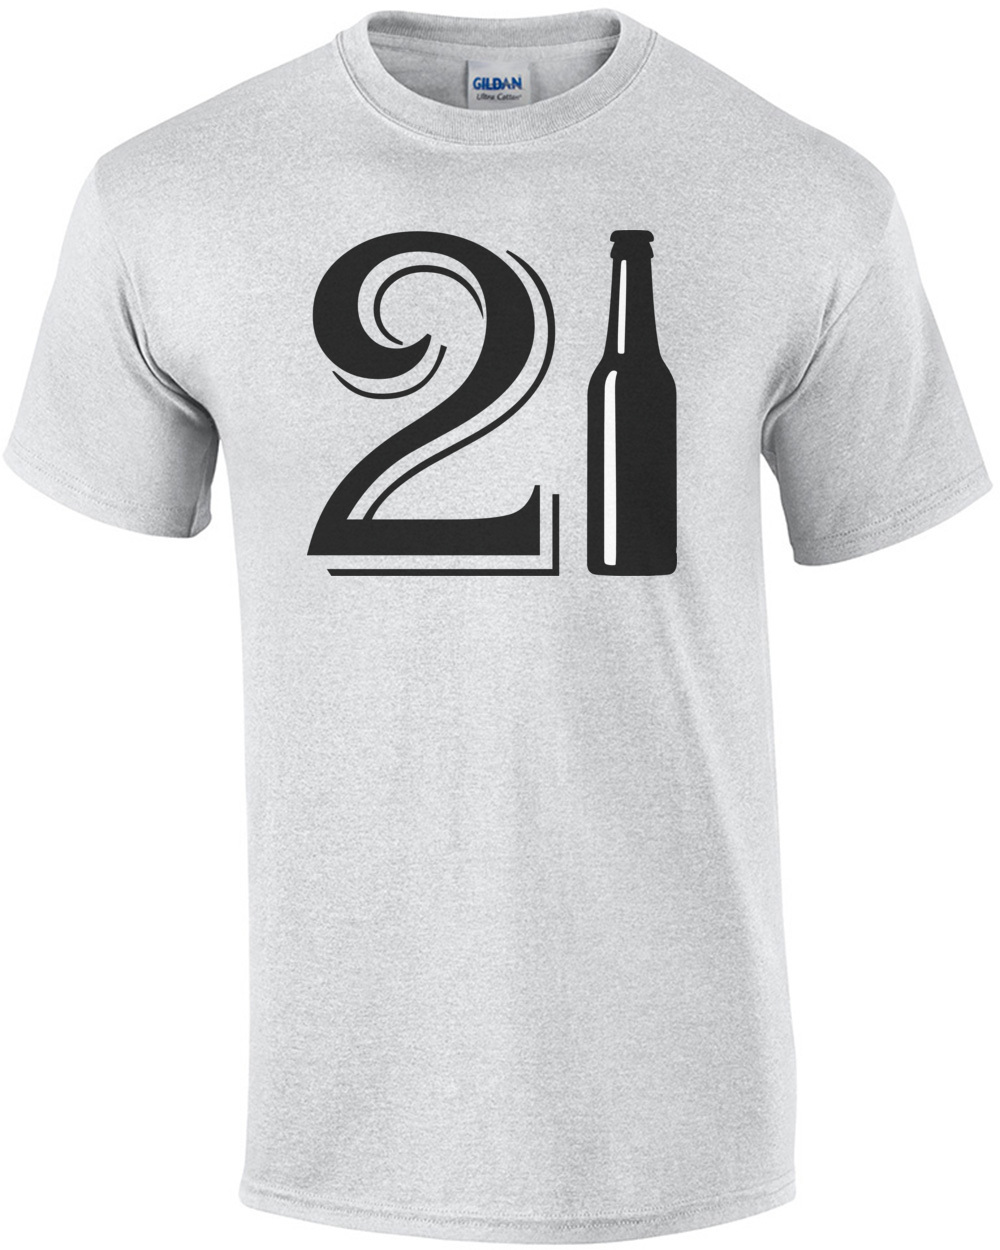 21 Birthday Beer Bottle Happy Tshirt Mens Regular Ash